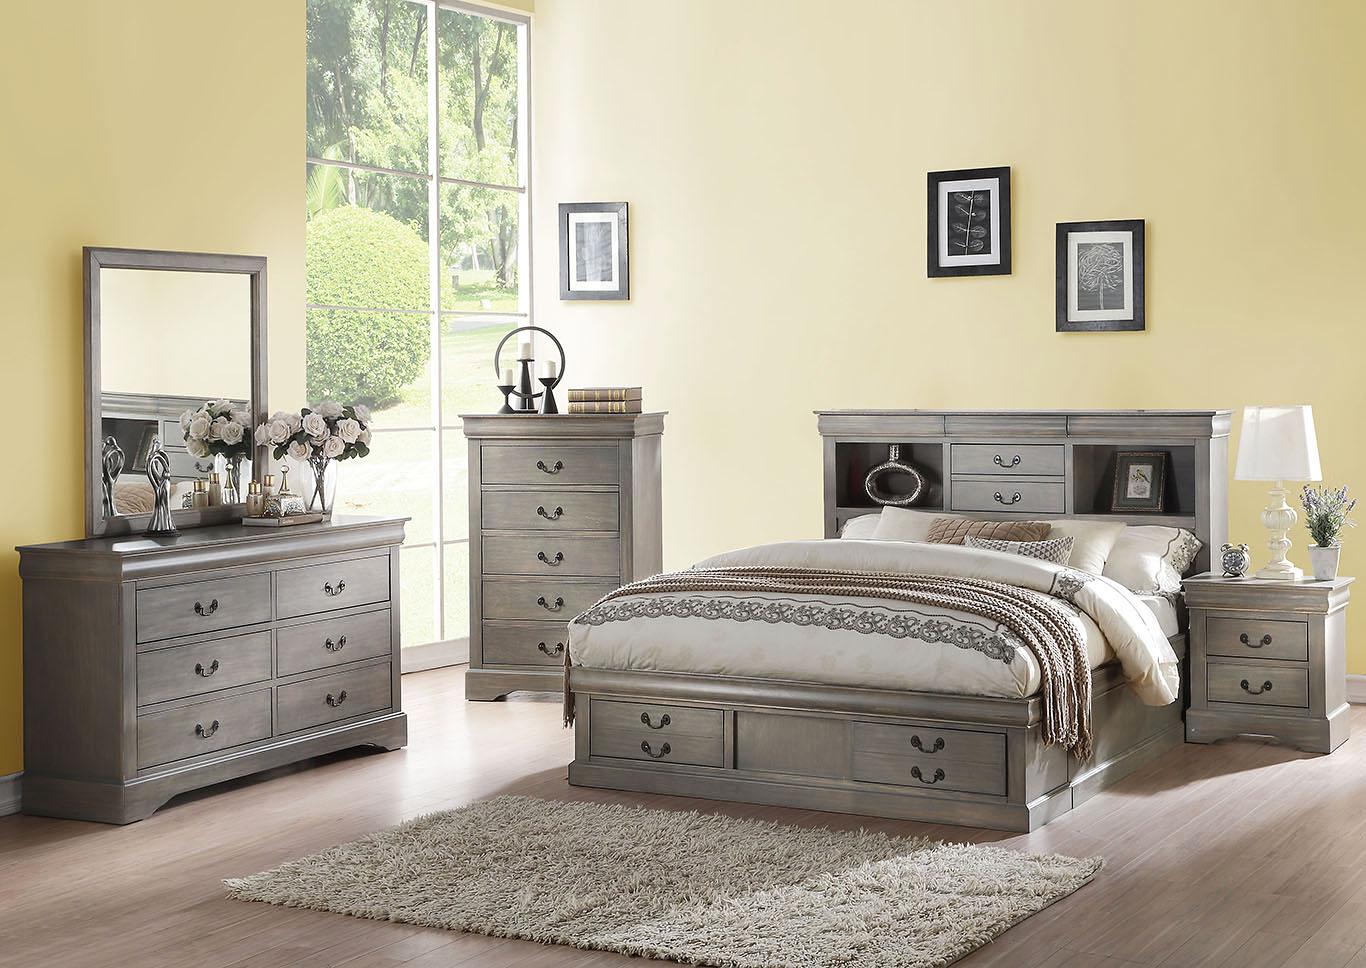 aeb27c4a6a6e1 Louis Philippe III California King Storage Bed w Dresser   Mirror